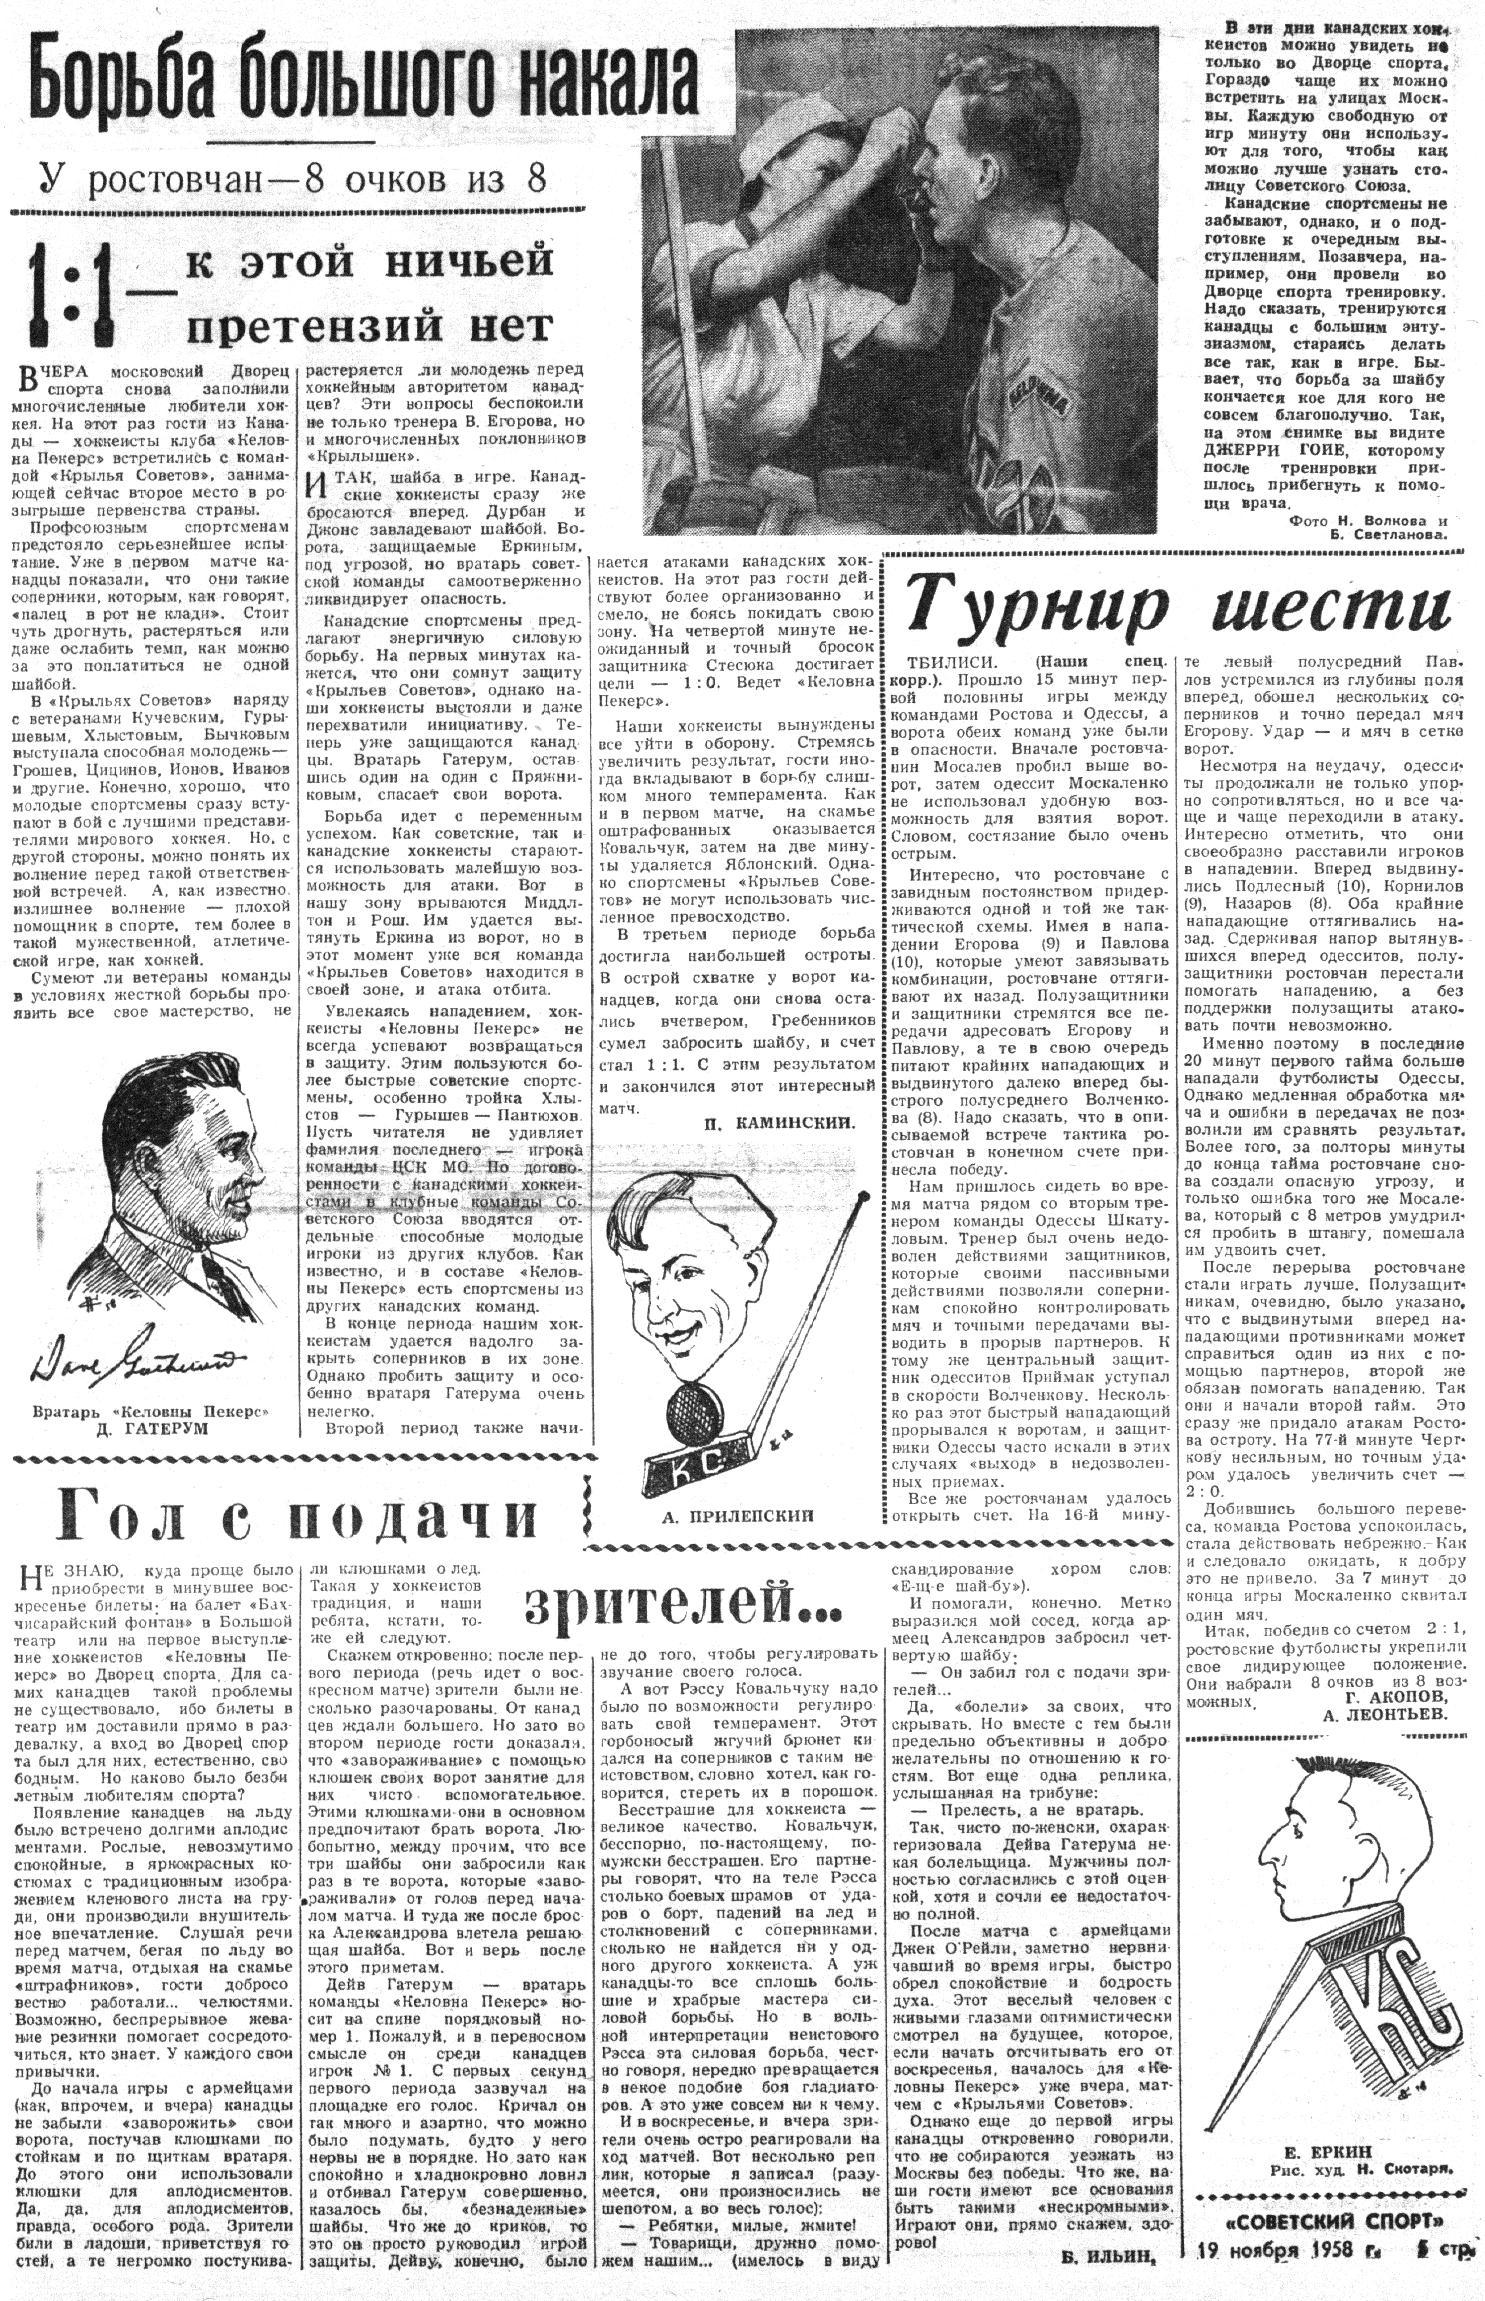 Sovetskiy_Sport_1958_11_19_N272_s5.JPG